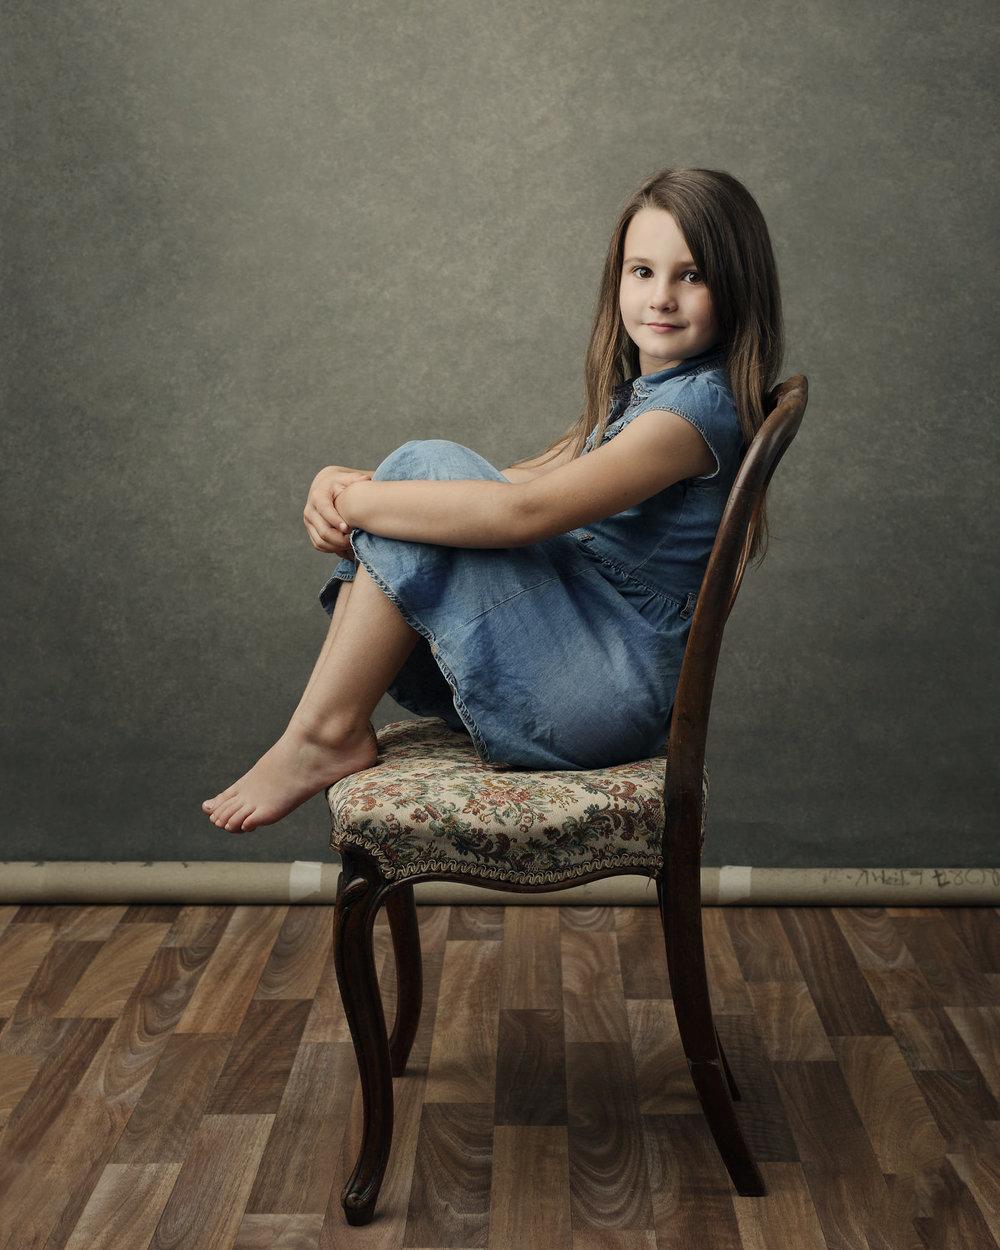 Isabelle_Angus0026.jpg